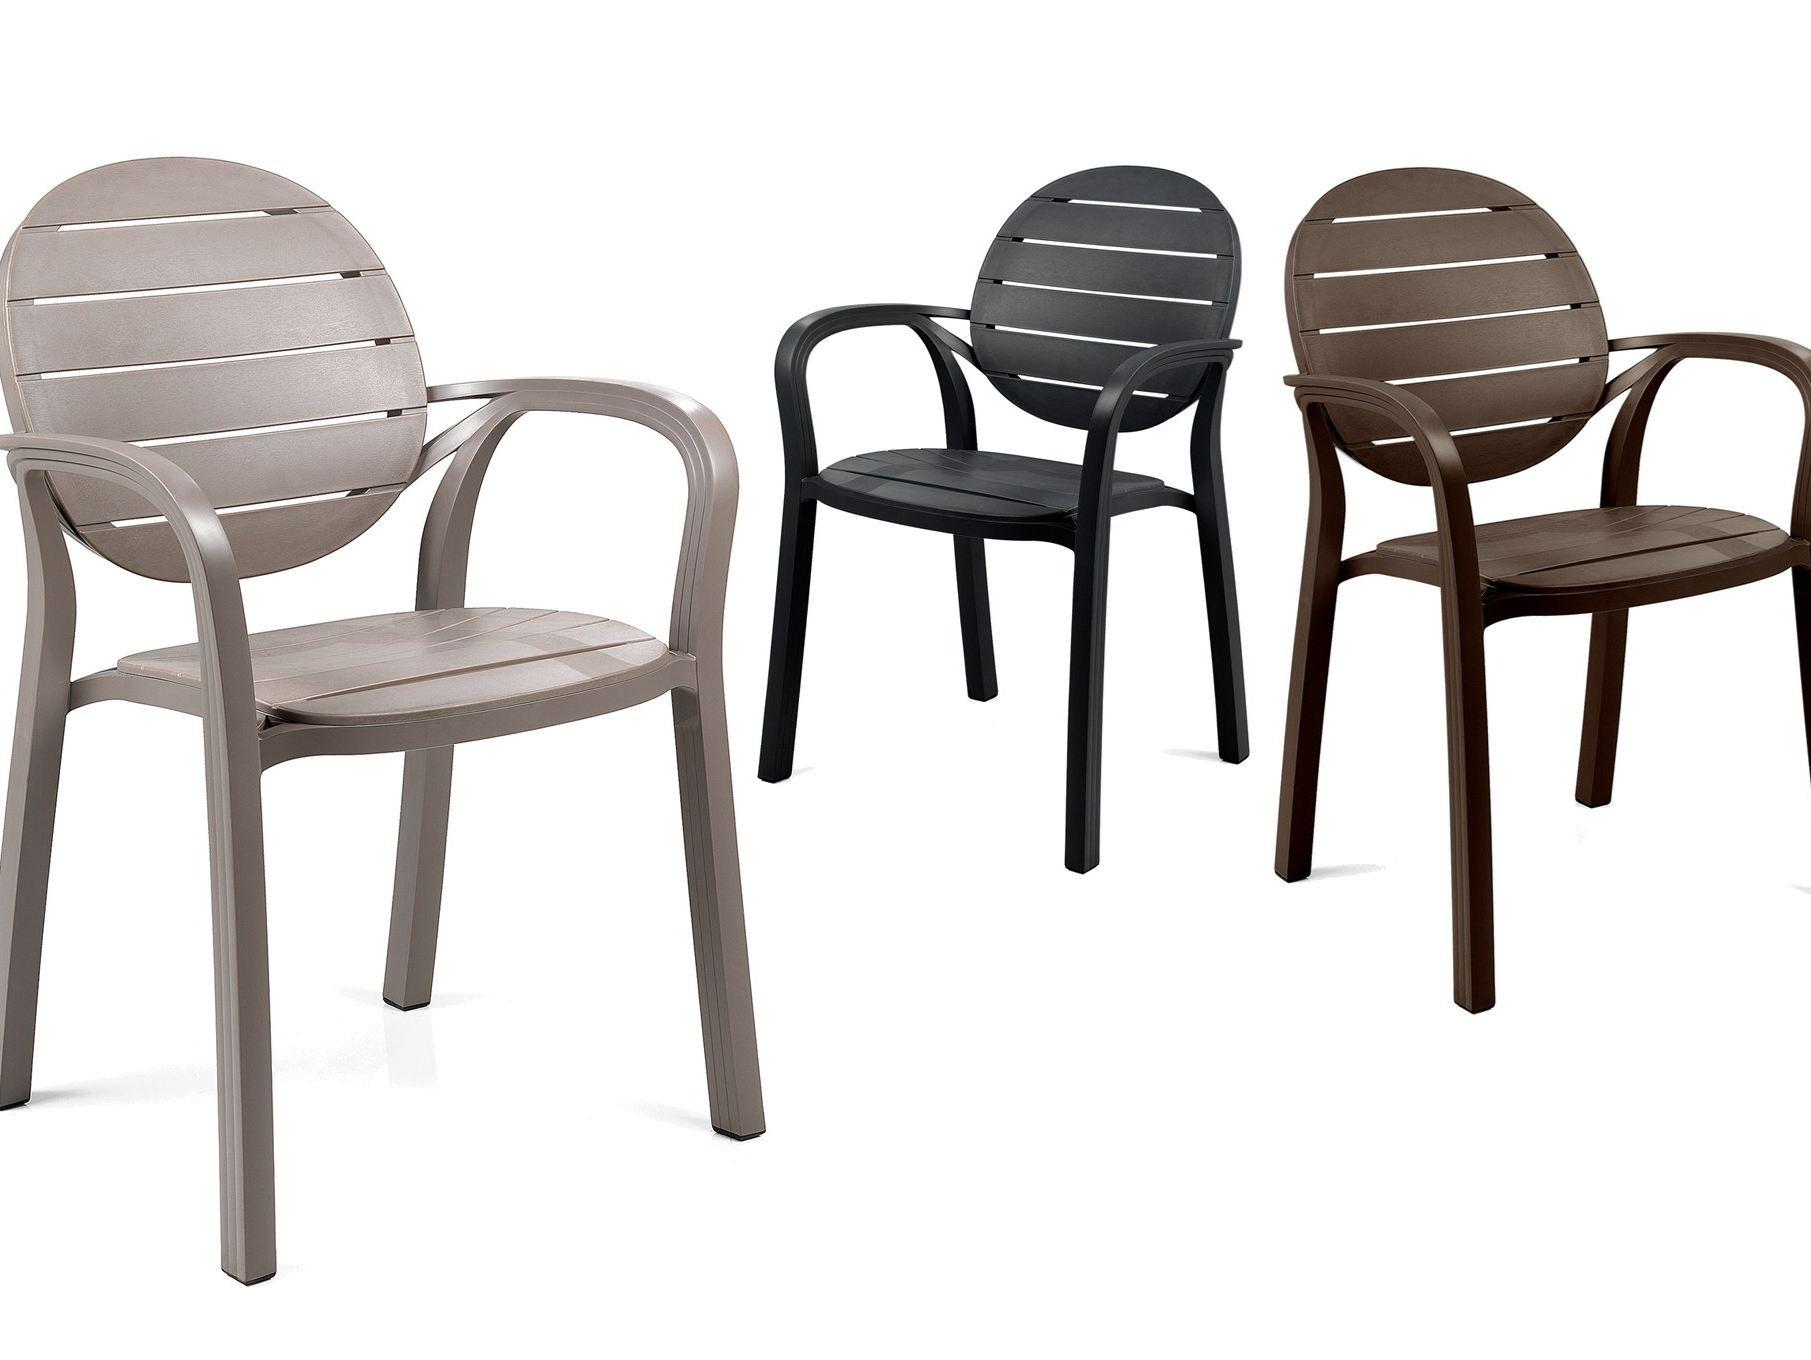 Sedia da giardino net relax nardi nardi interni a prezzo ribassato